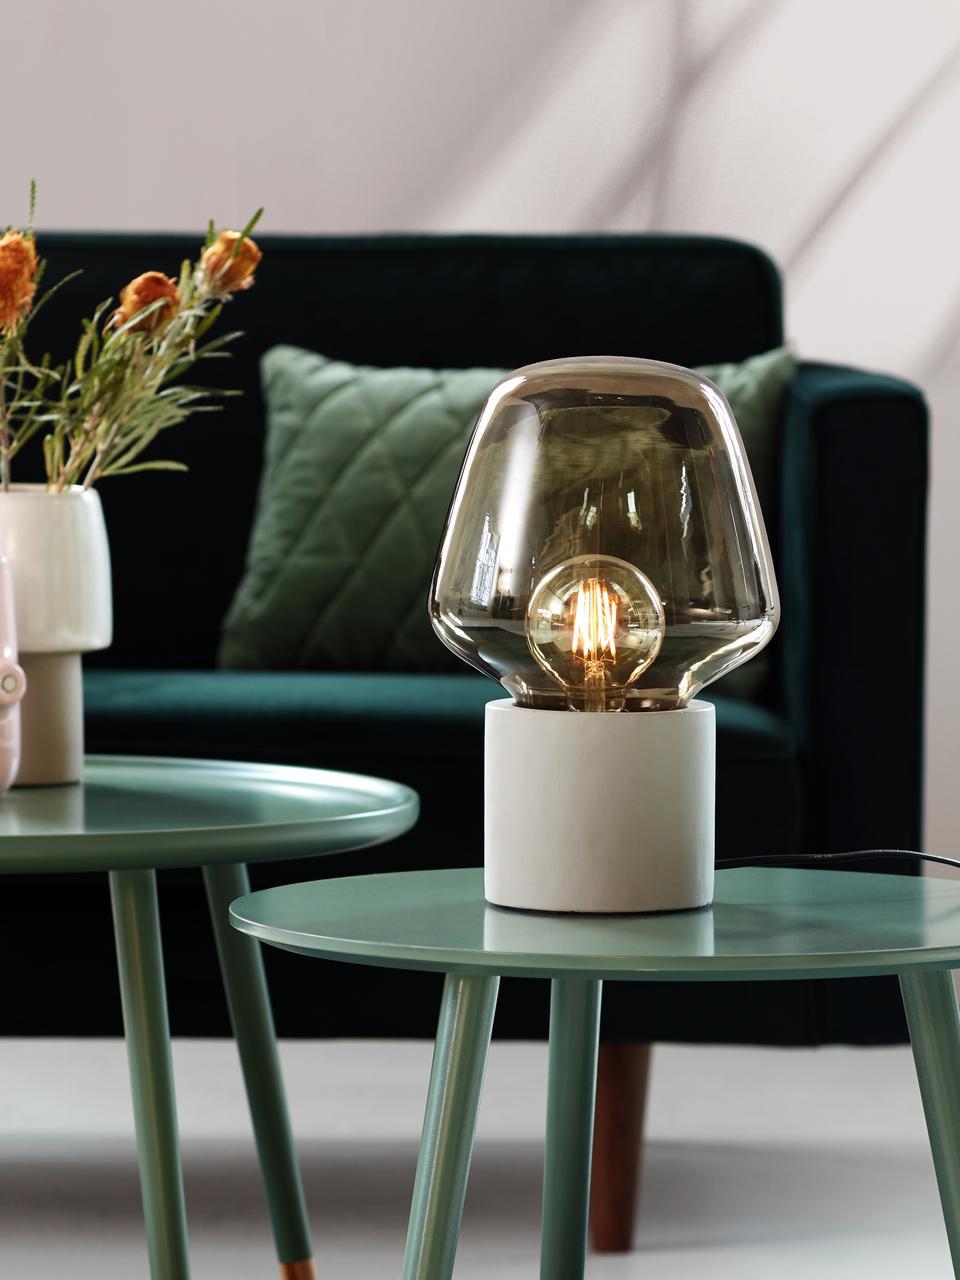 Kleine Tischlampe Christina mit Betonfuß, Lampenschirm: Glas, Lampenfuß: Beton, Betongrau, Grau, transparent, Ø 20 x H 30 cm